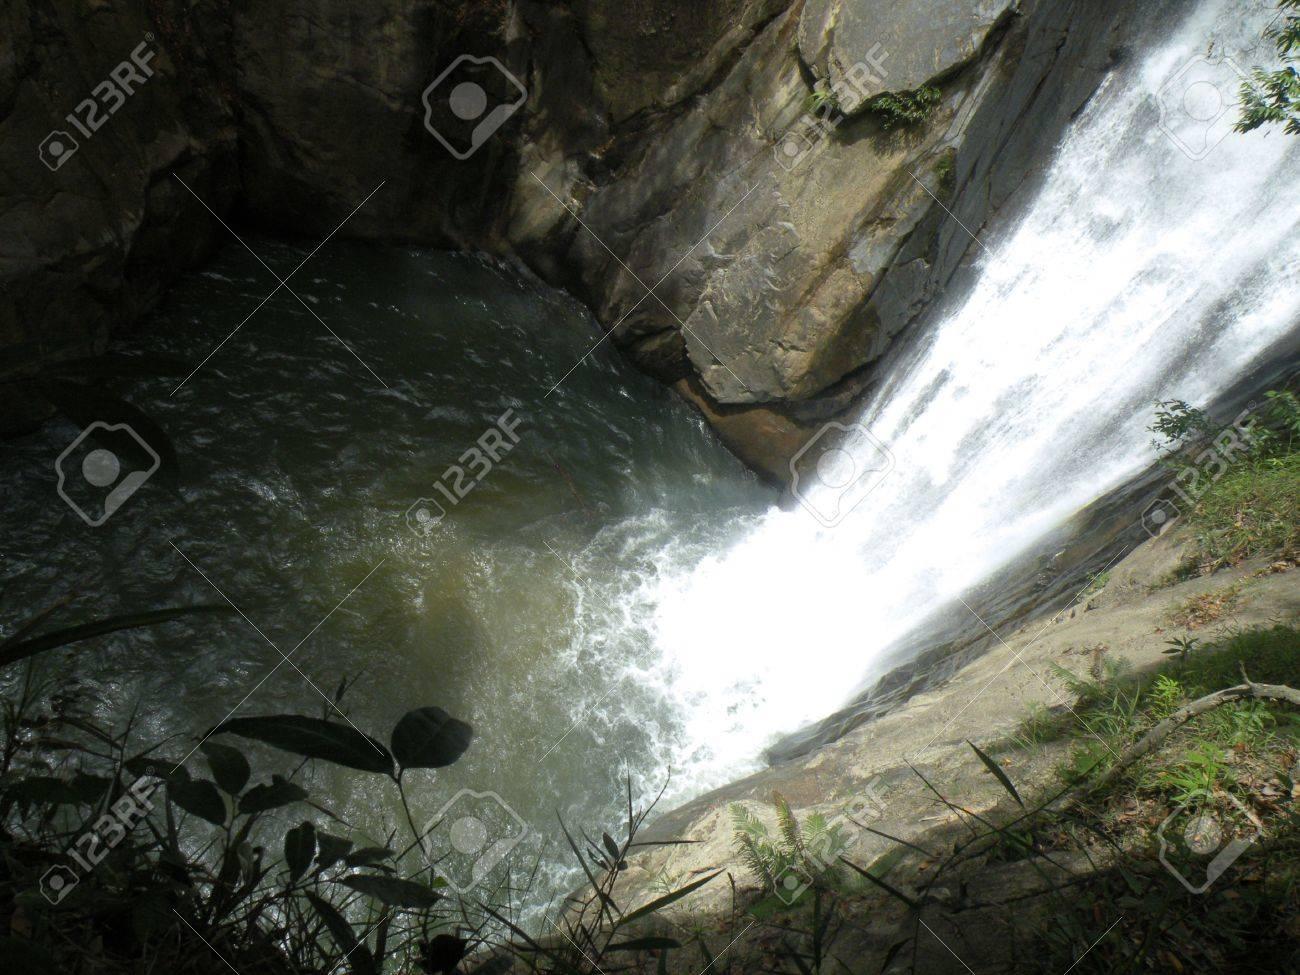 Chilling Waterfall Malaysia Chilling Waterfalls in